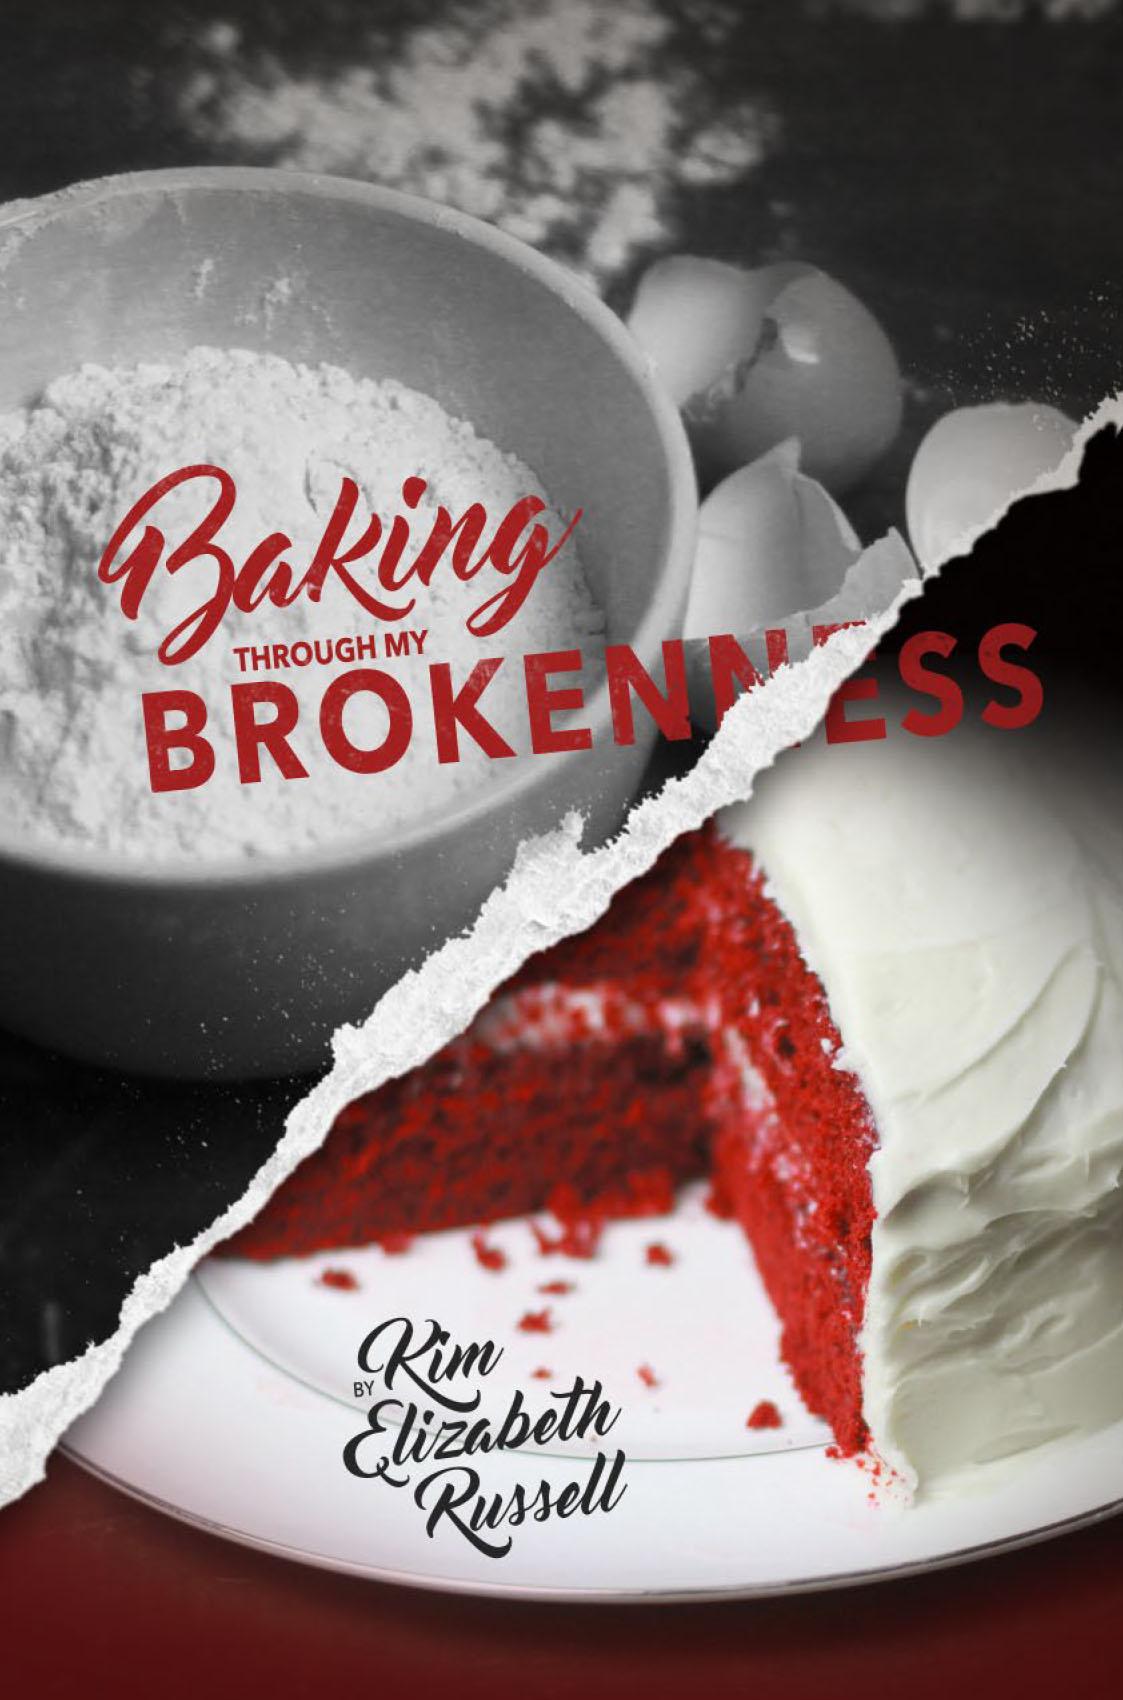 Baking Through My Brokenness